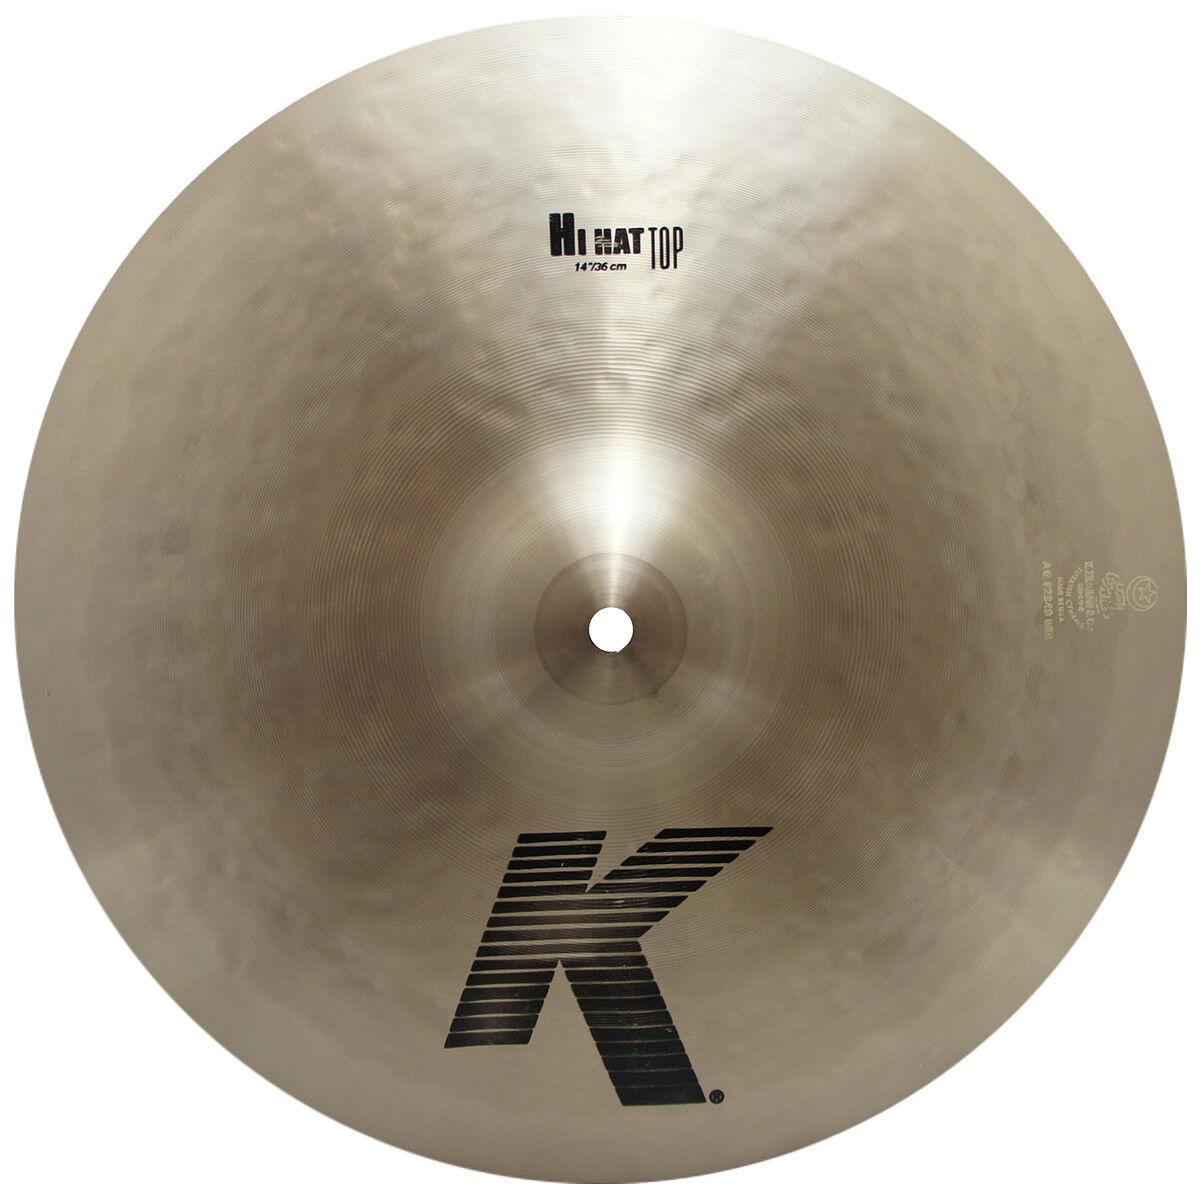 Zildjian K0824 14  Hi Hat Top Drumset Cymbal Medium Weight & Low Pitch - Used